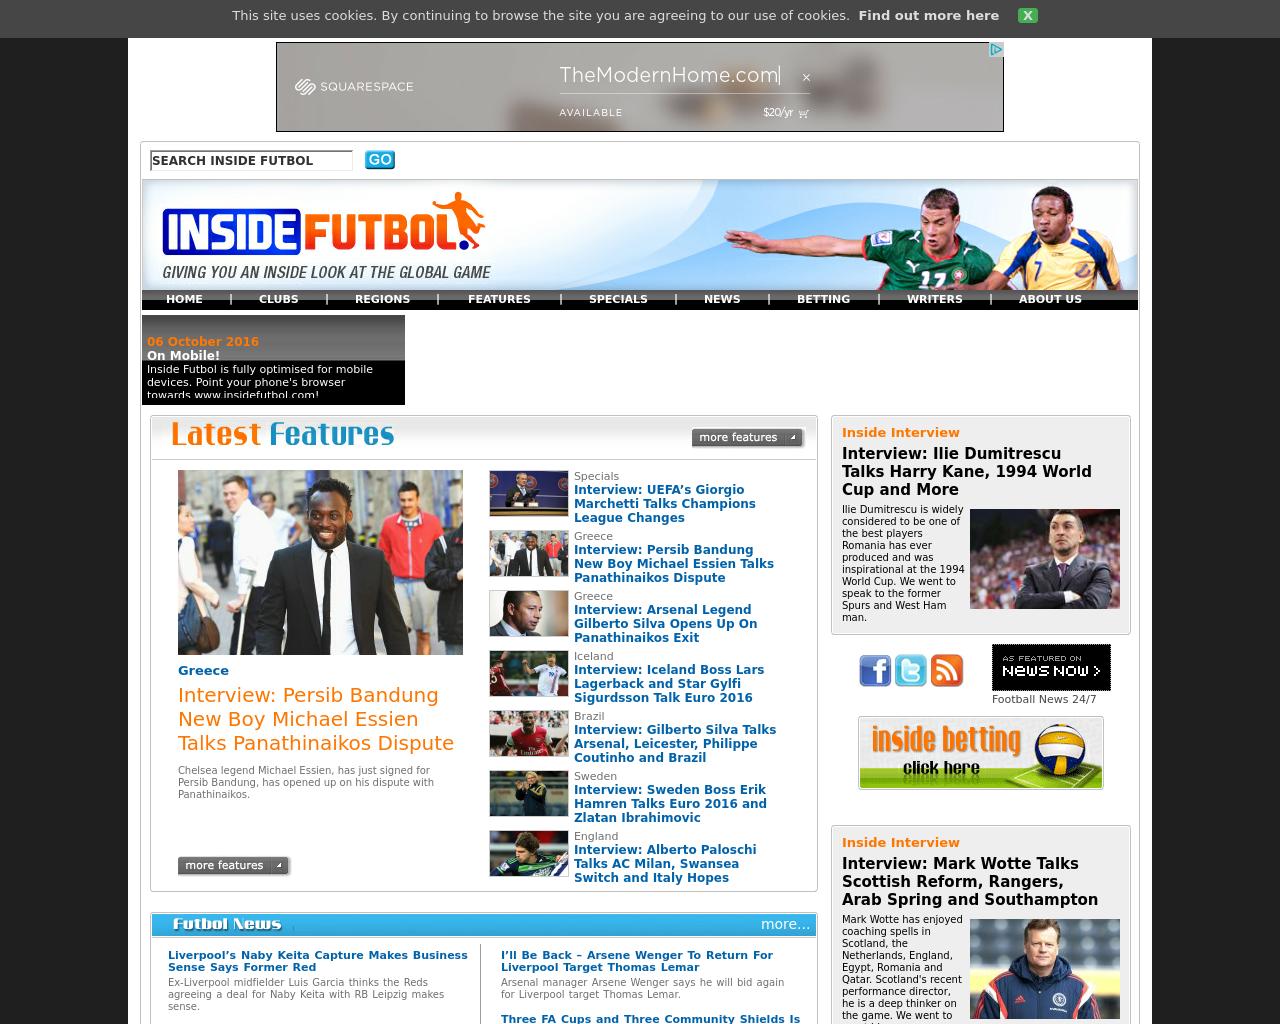 Inside-Futbol-Advertising-Reviews-Pricing